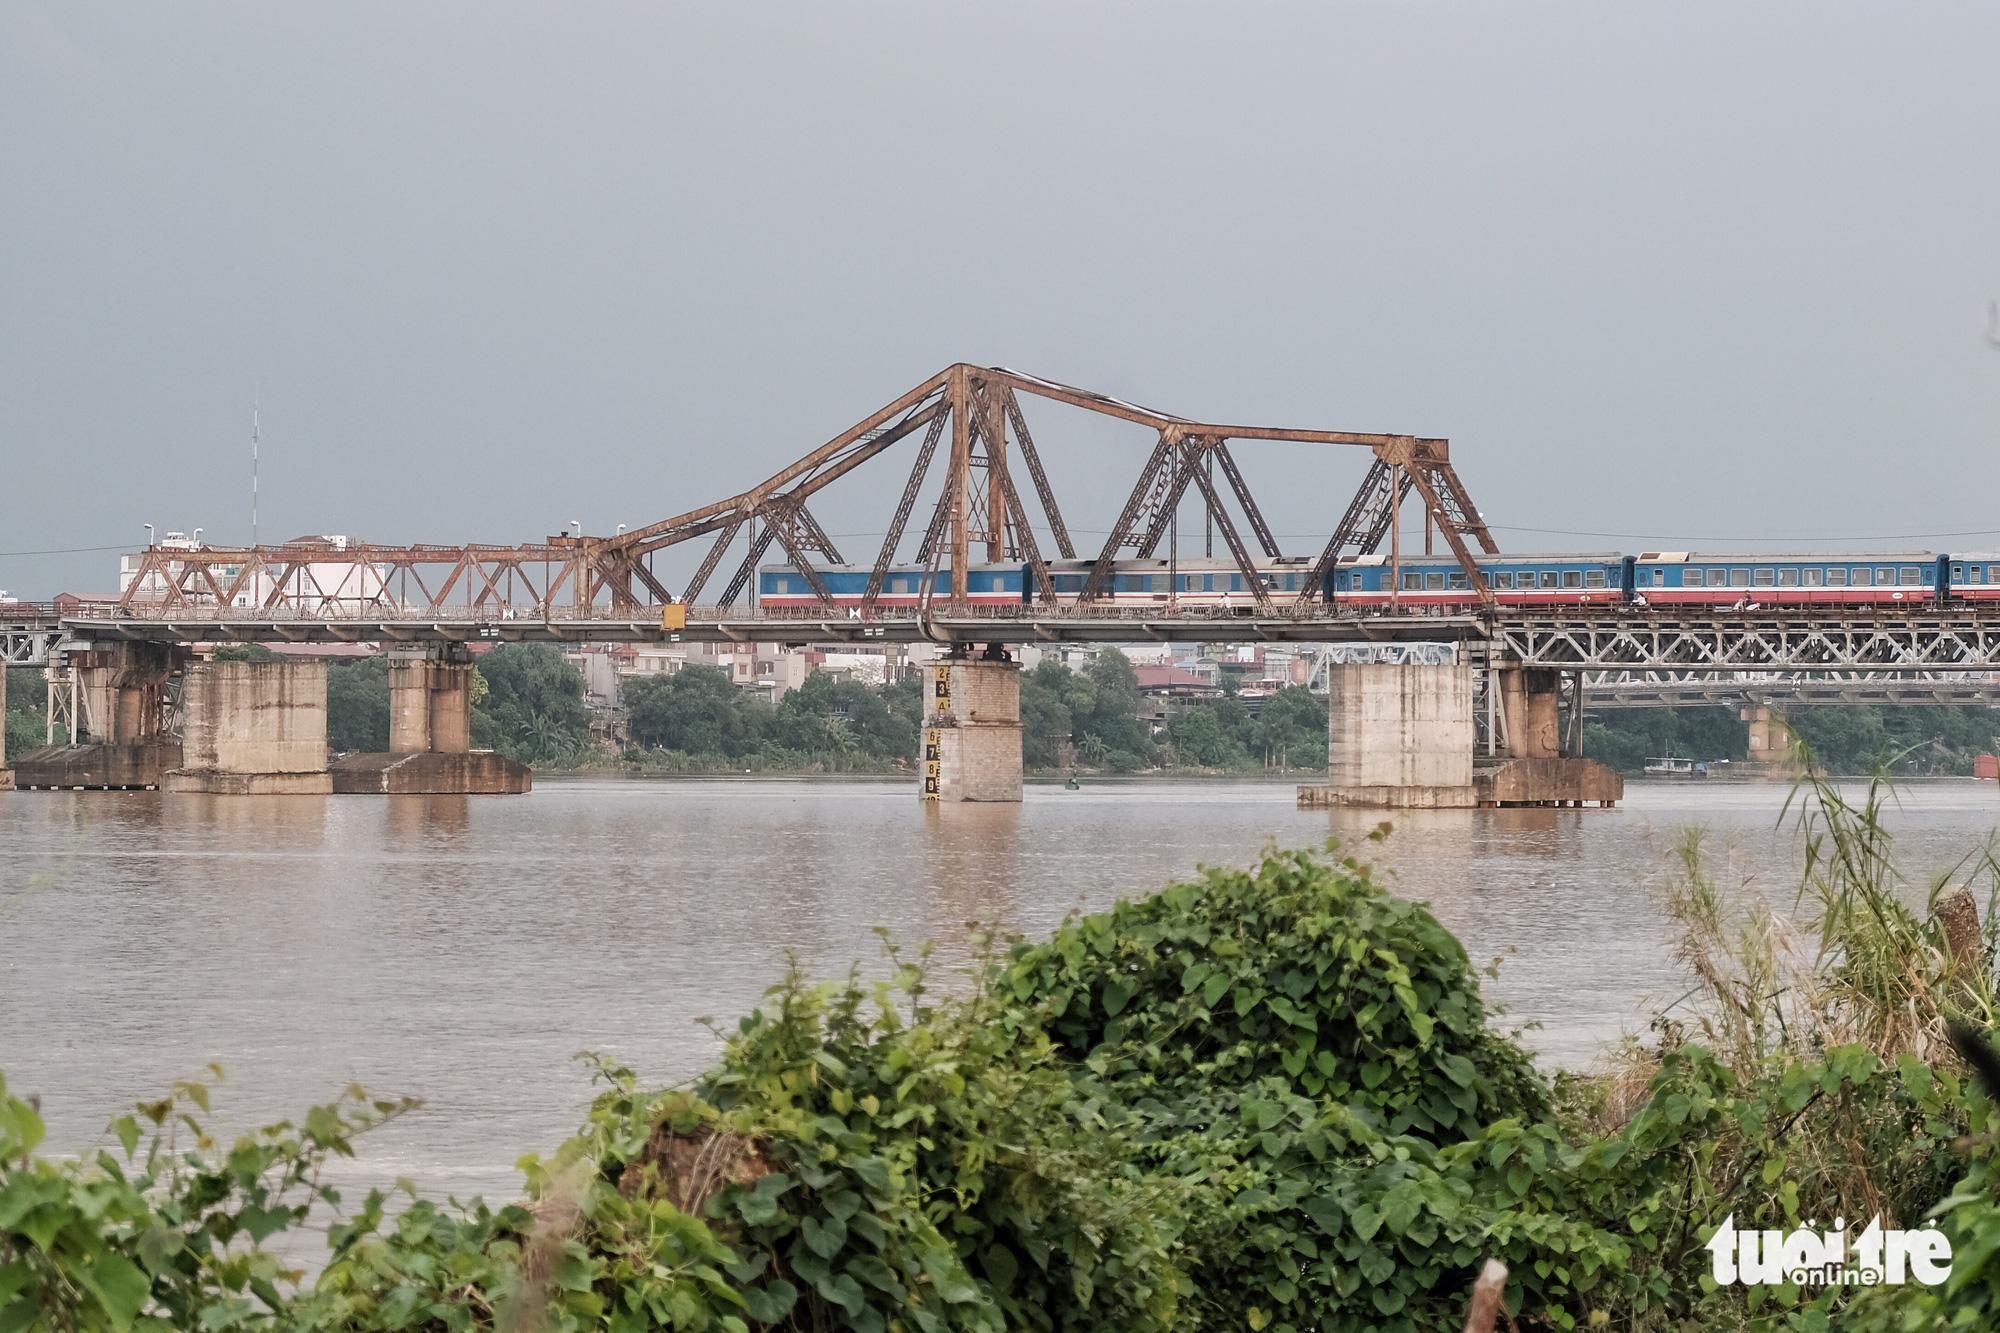 Long Bien Bridge crosses the Hong River in Hanoi in this photo taken on August 22, 2020. Photo: Mai Thuong / Tuoi Tre